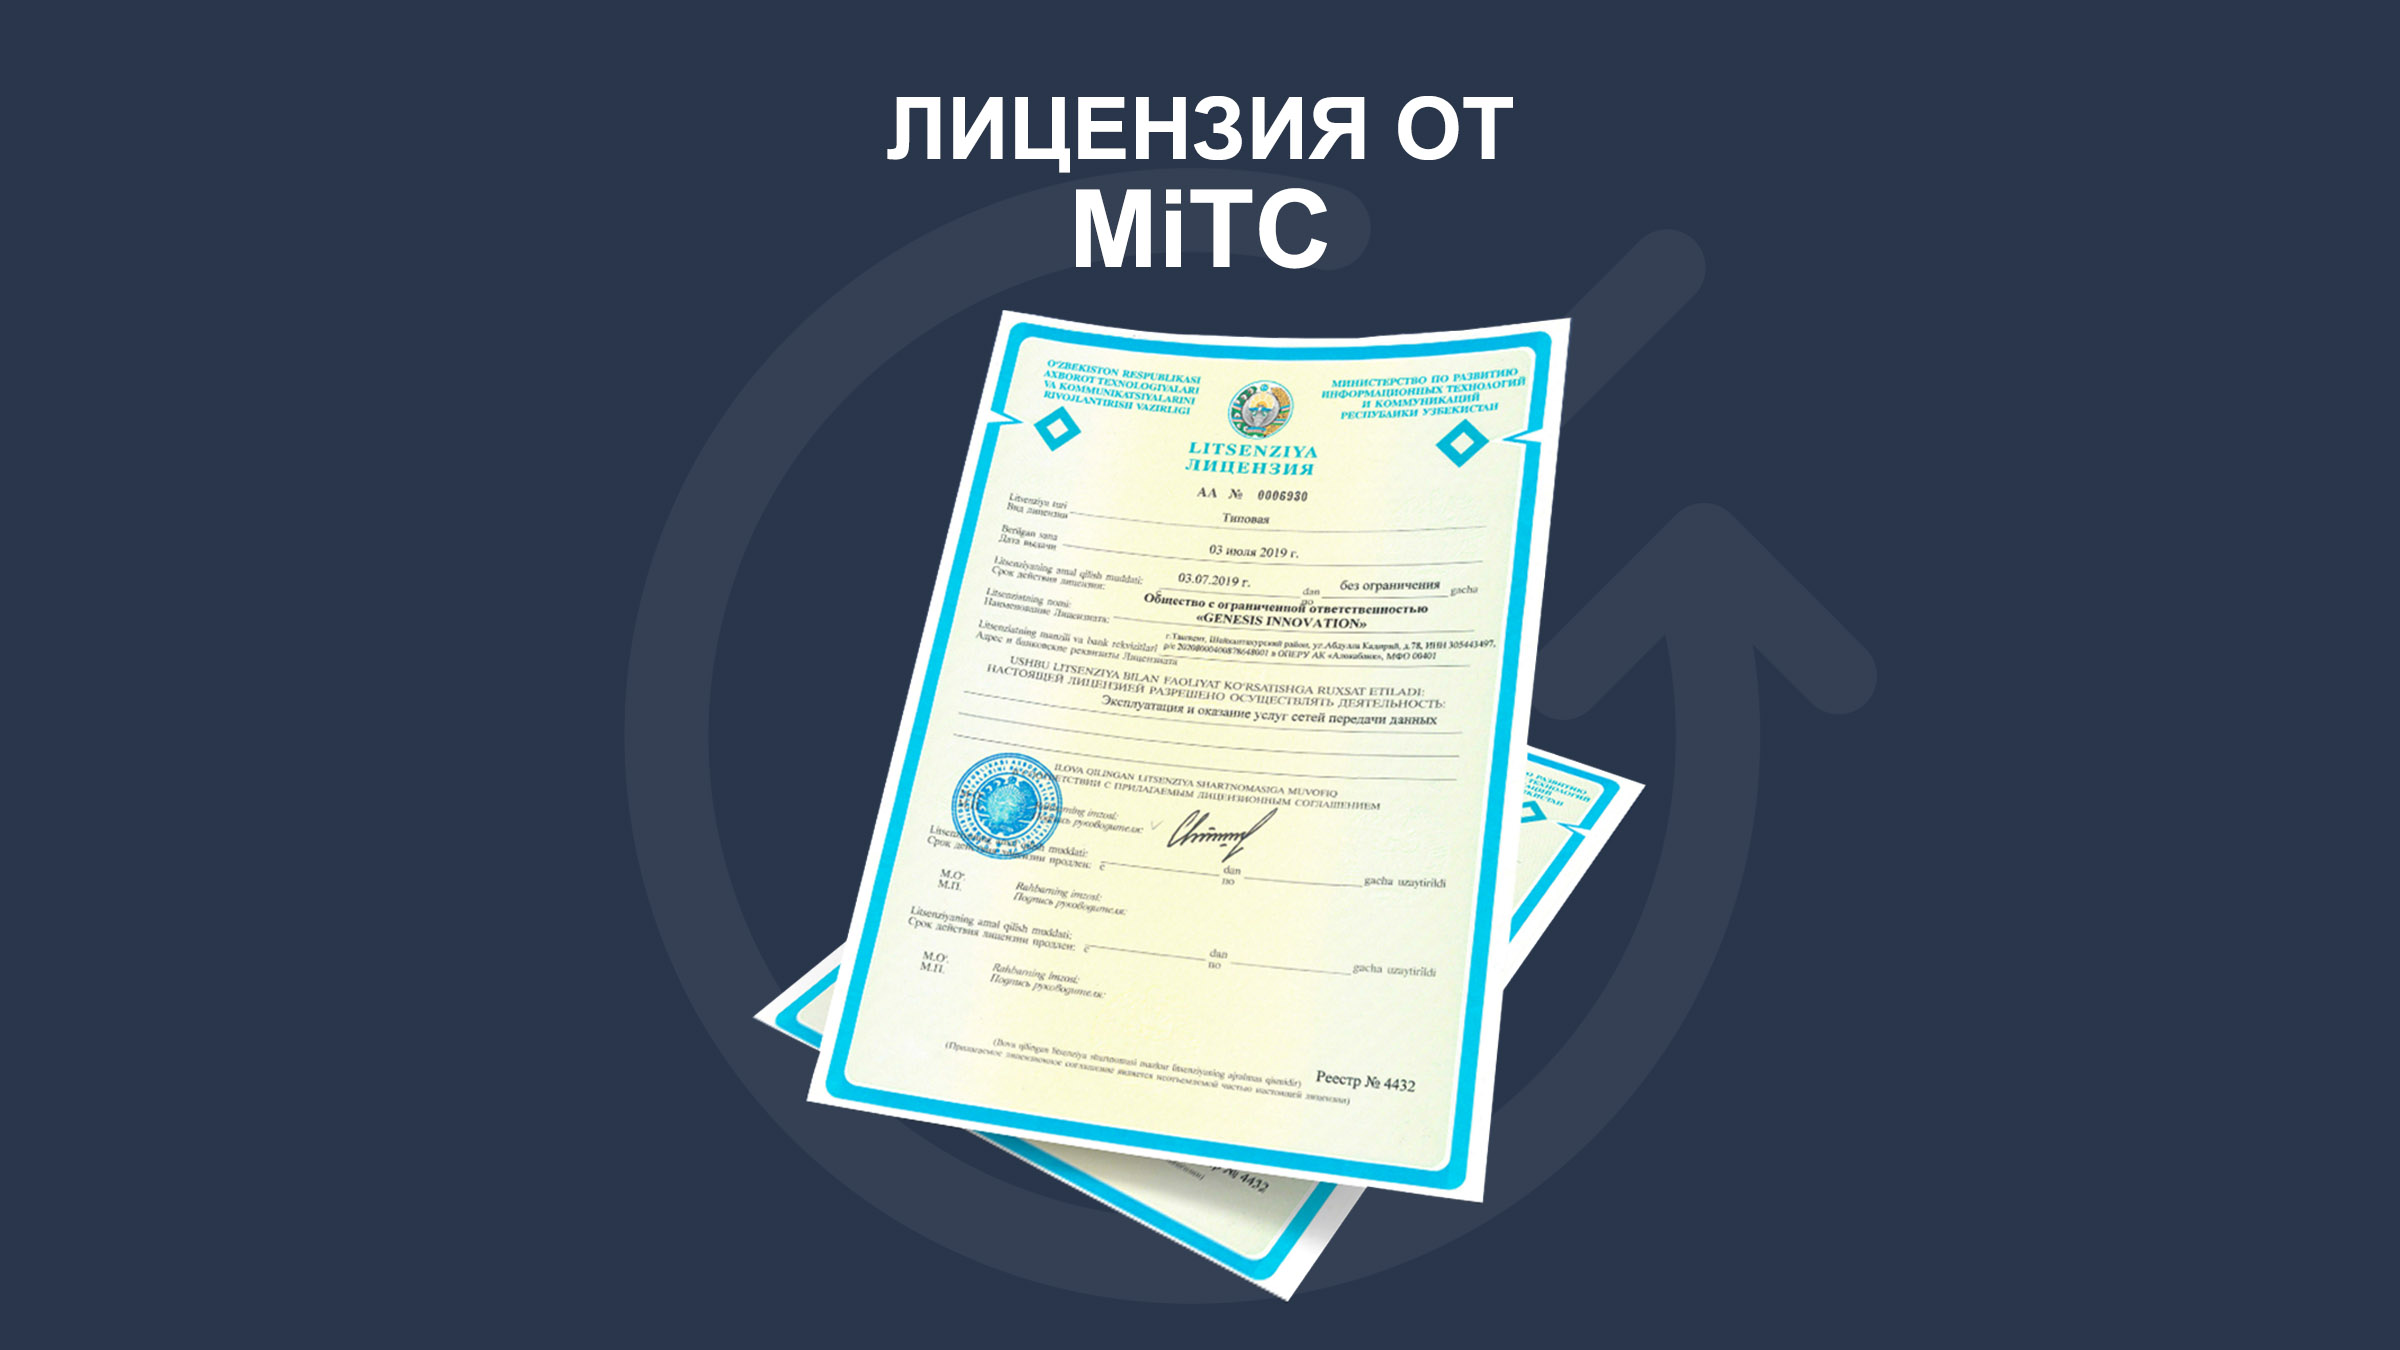 MiTC dan Litsenziya